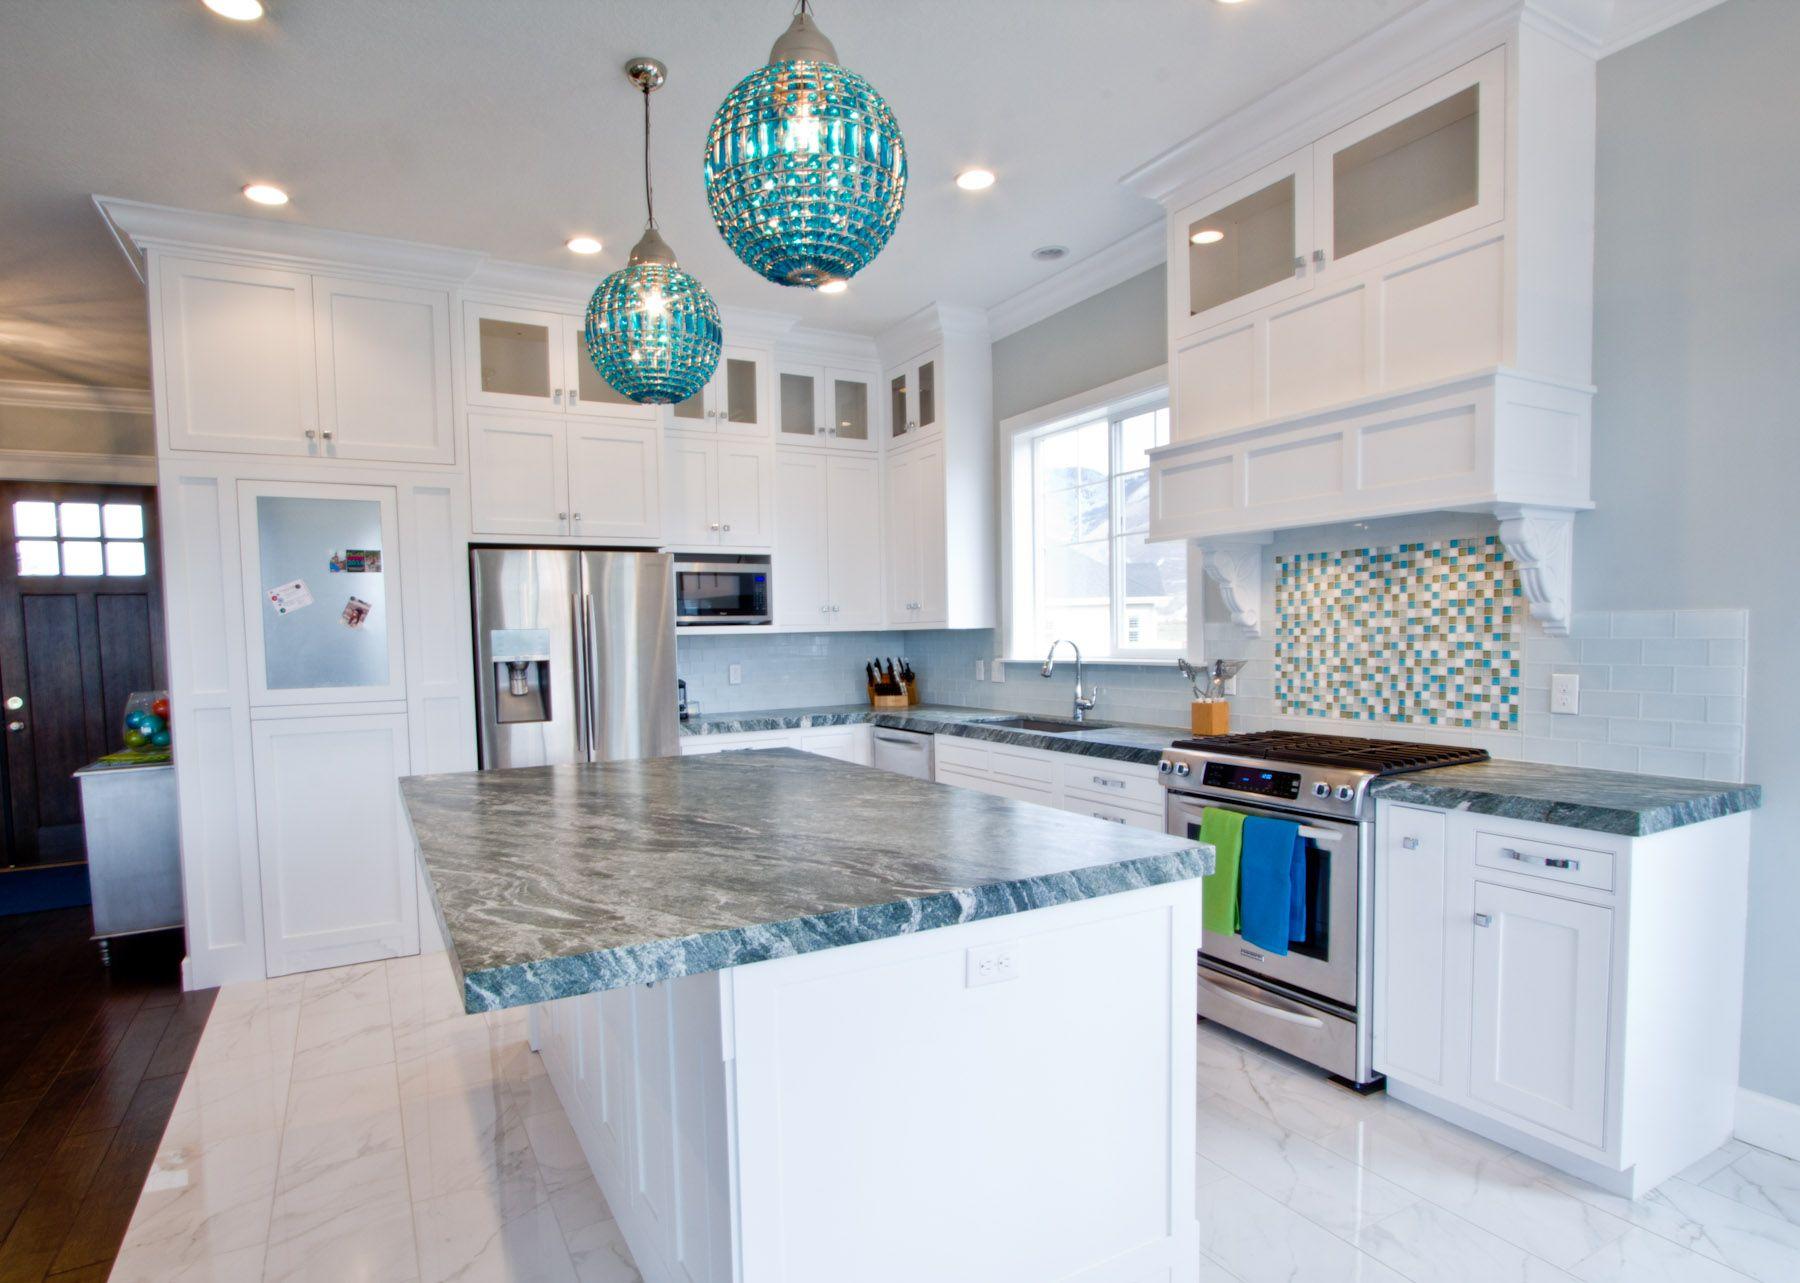 Coastal Kitchen Design Interior stylish coastal kitchenfor home design ideas with coastal kitchen